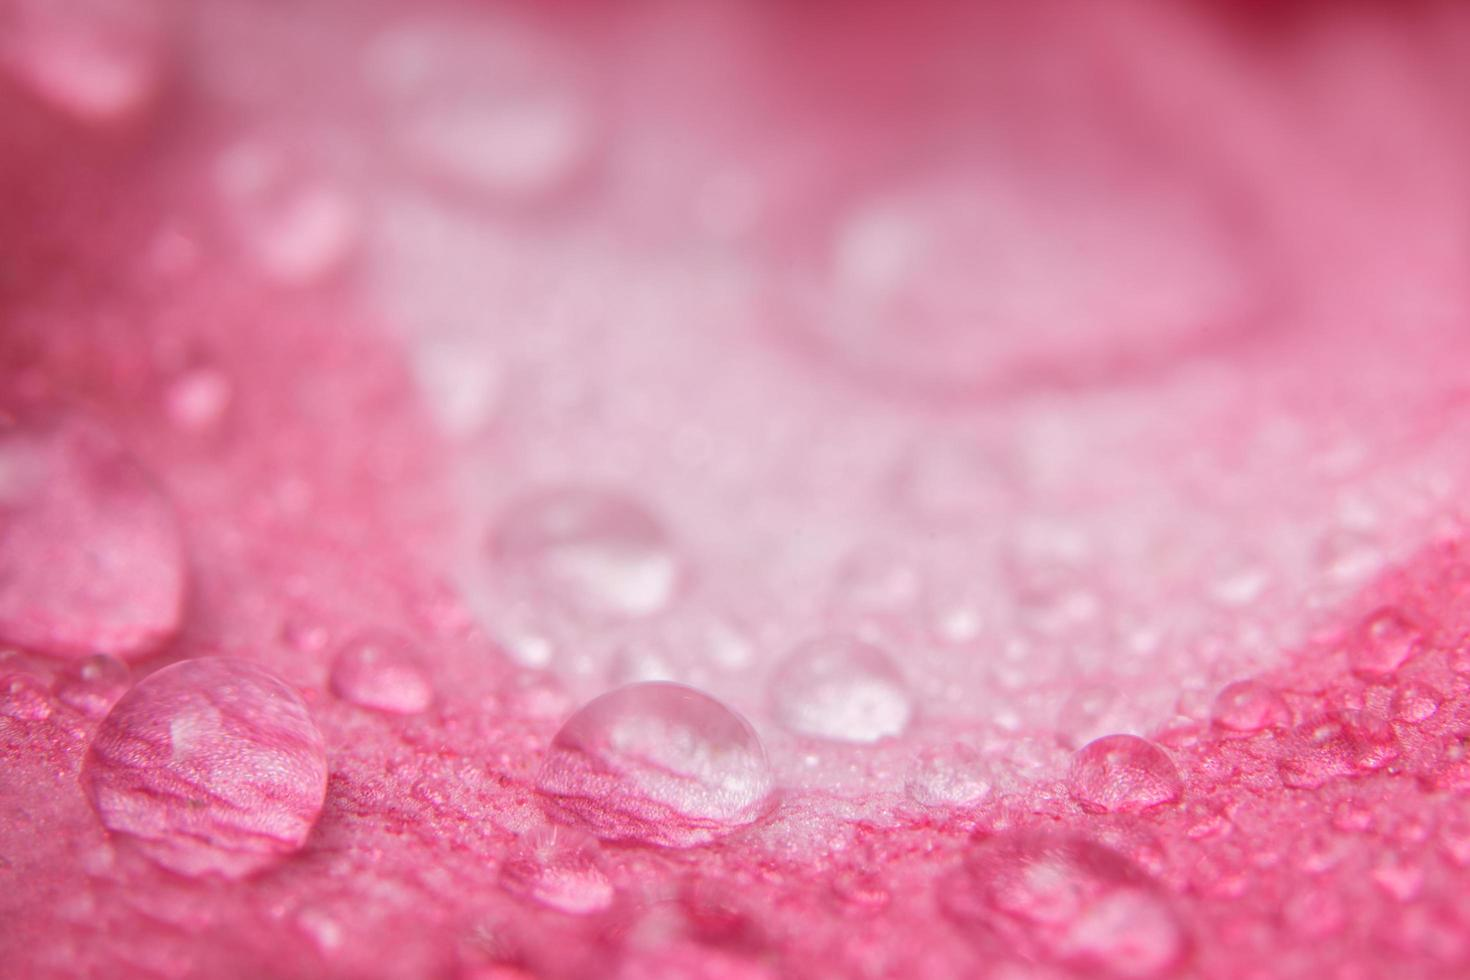 waterdruppels op bloemblaadjes foto